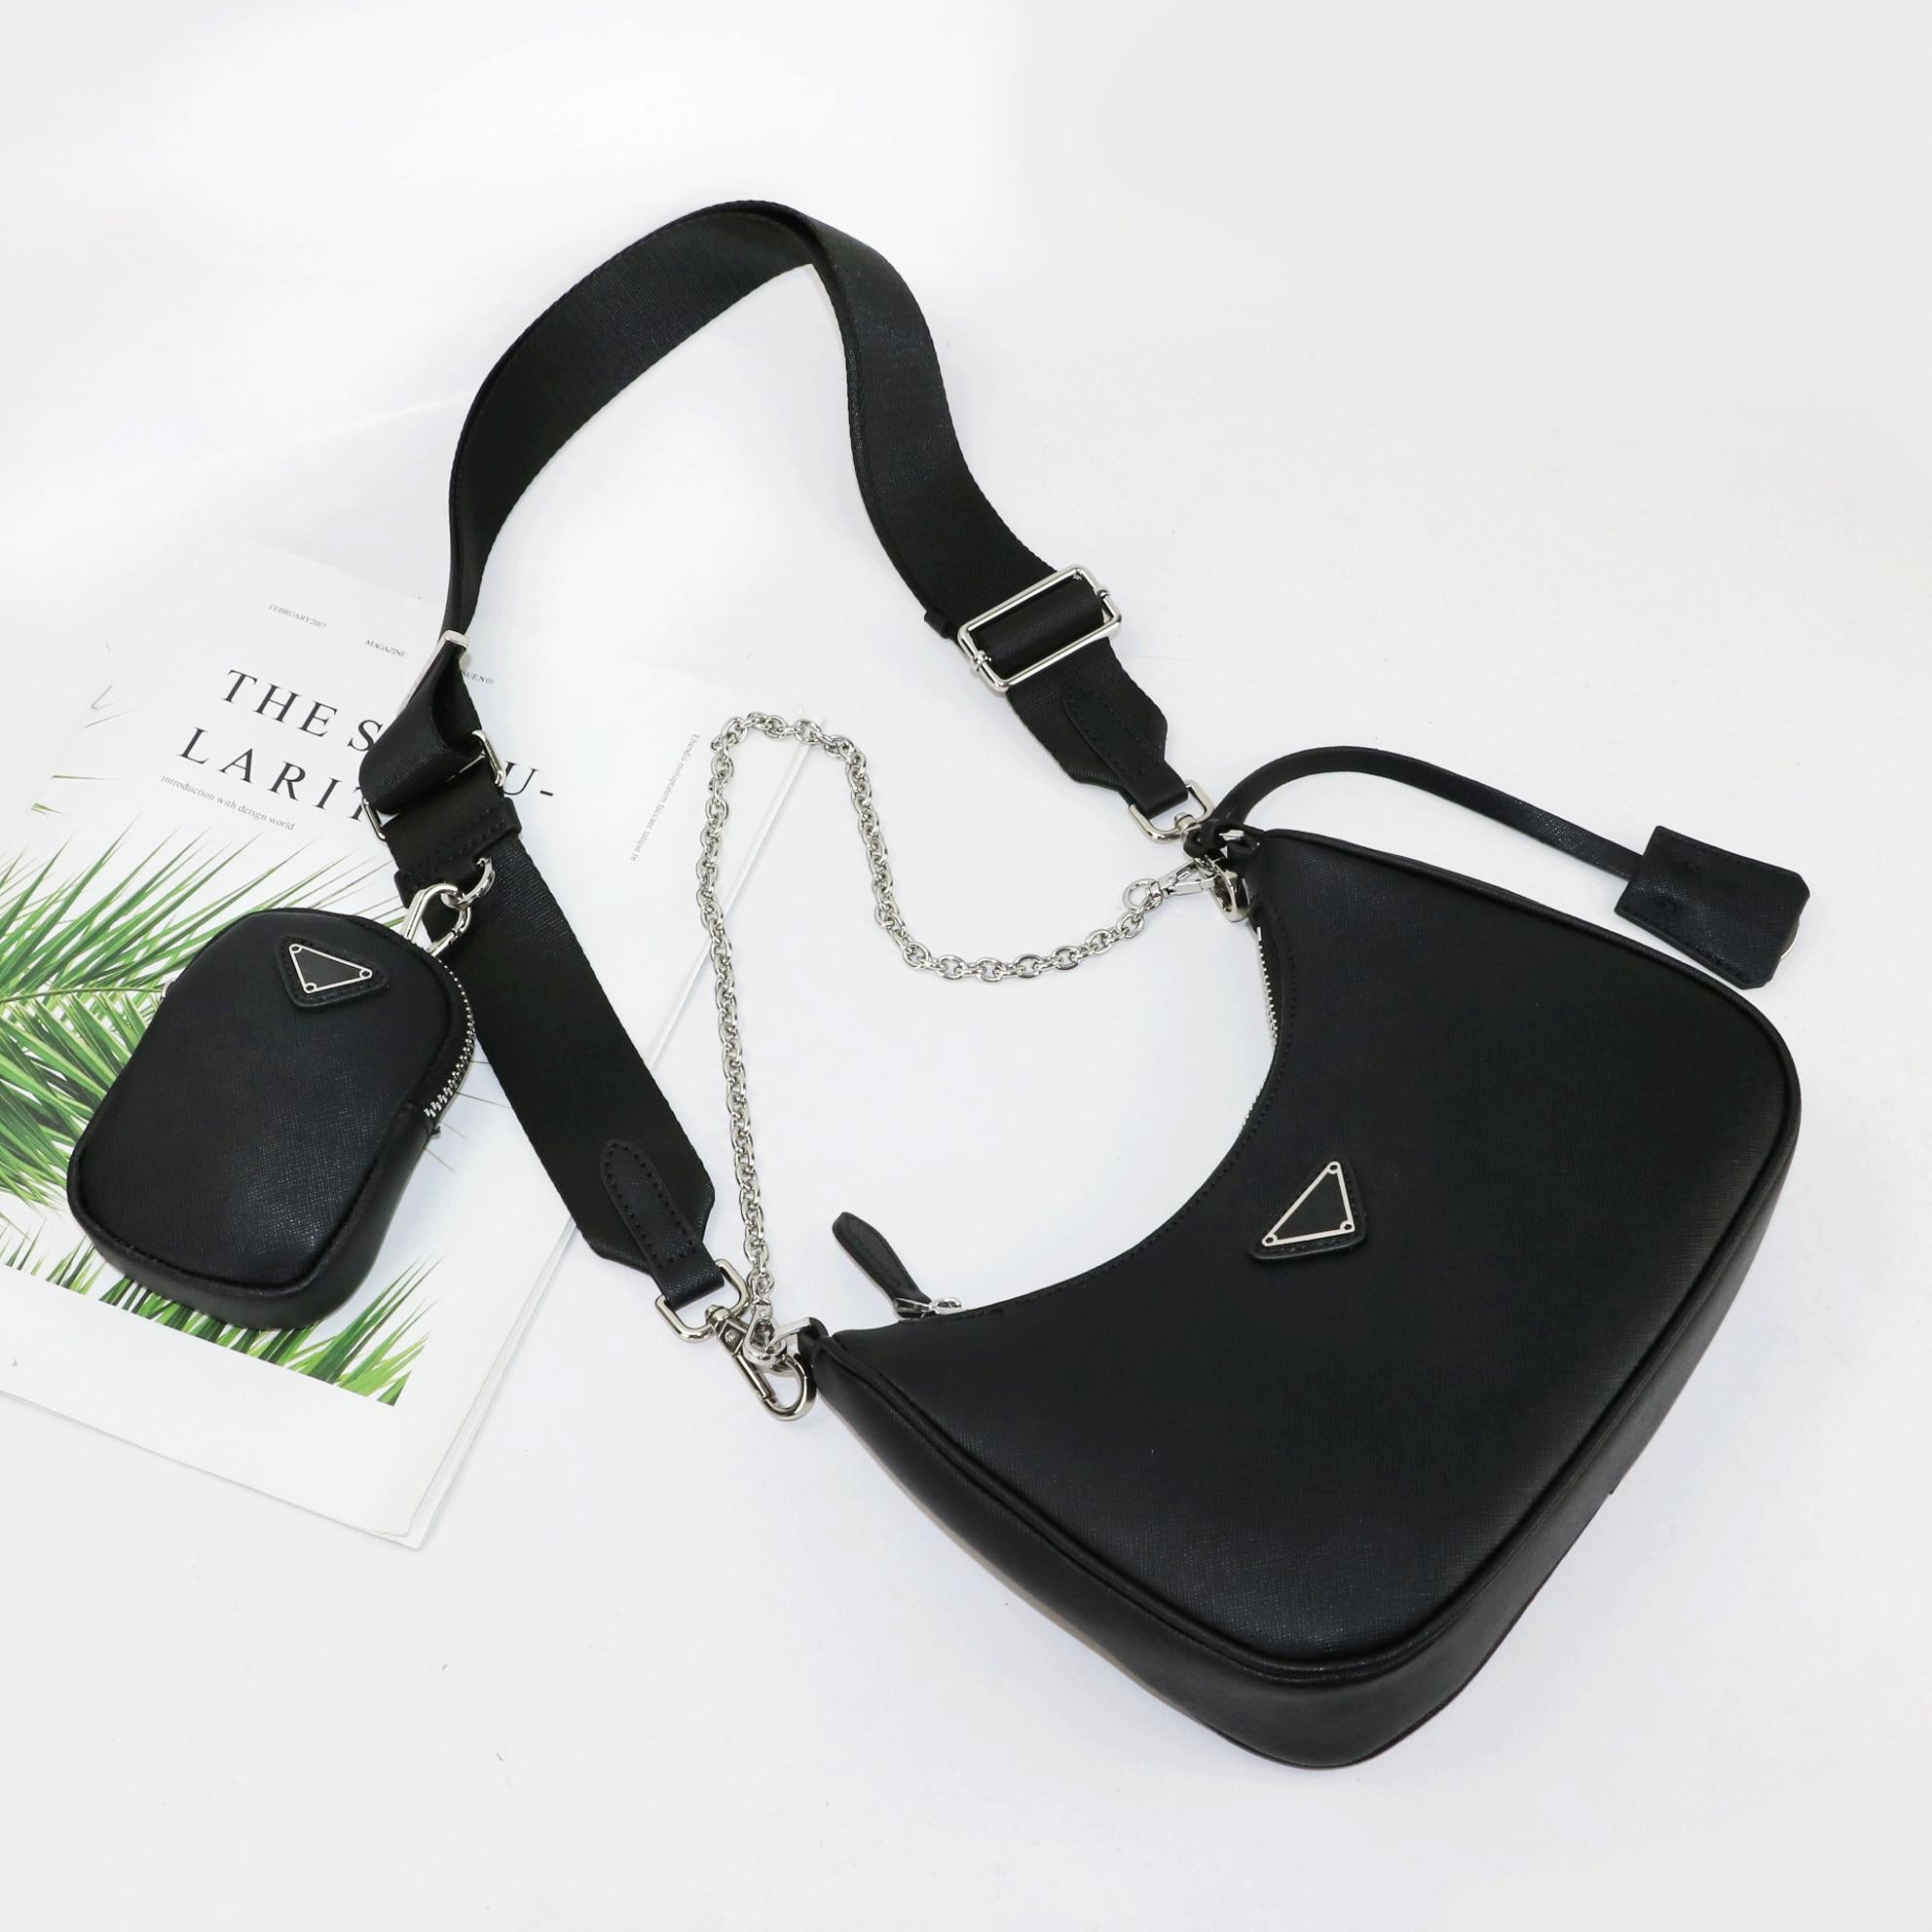 Retro Handbag Genuine Saffiano Leather Bag 3 in 1 Hobo bag with Small Pouch Women Hobo Shoulder Bag Fashion Ladies Bag